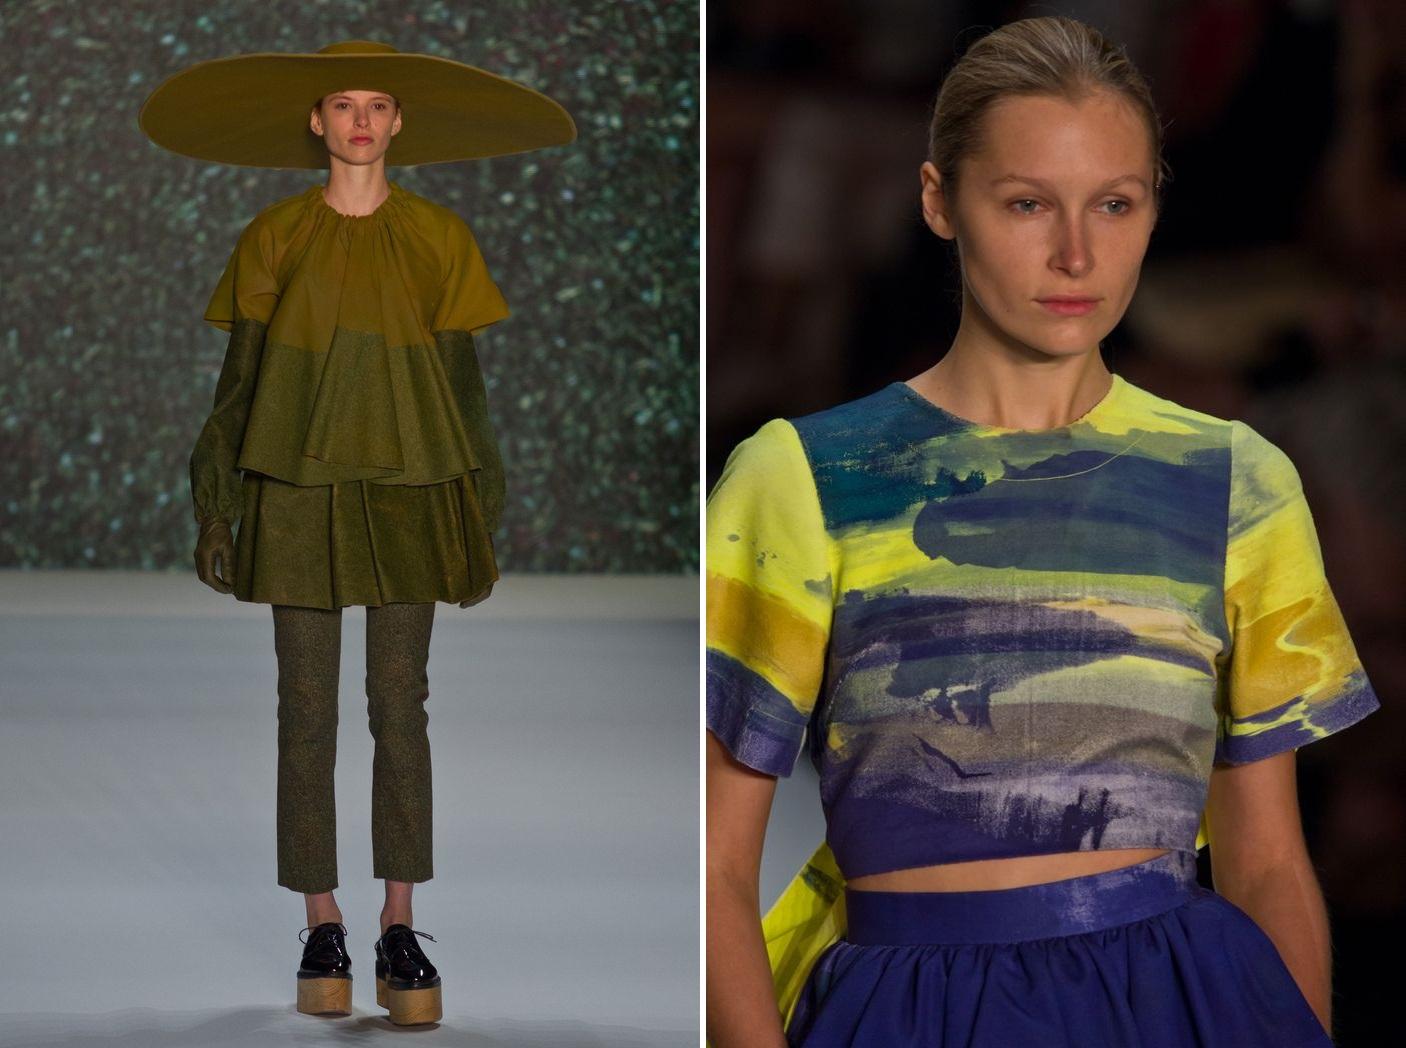 satu maaranen fashionvictress 03